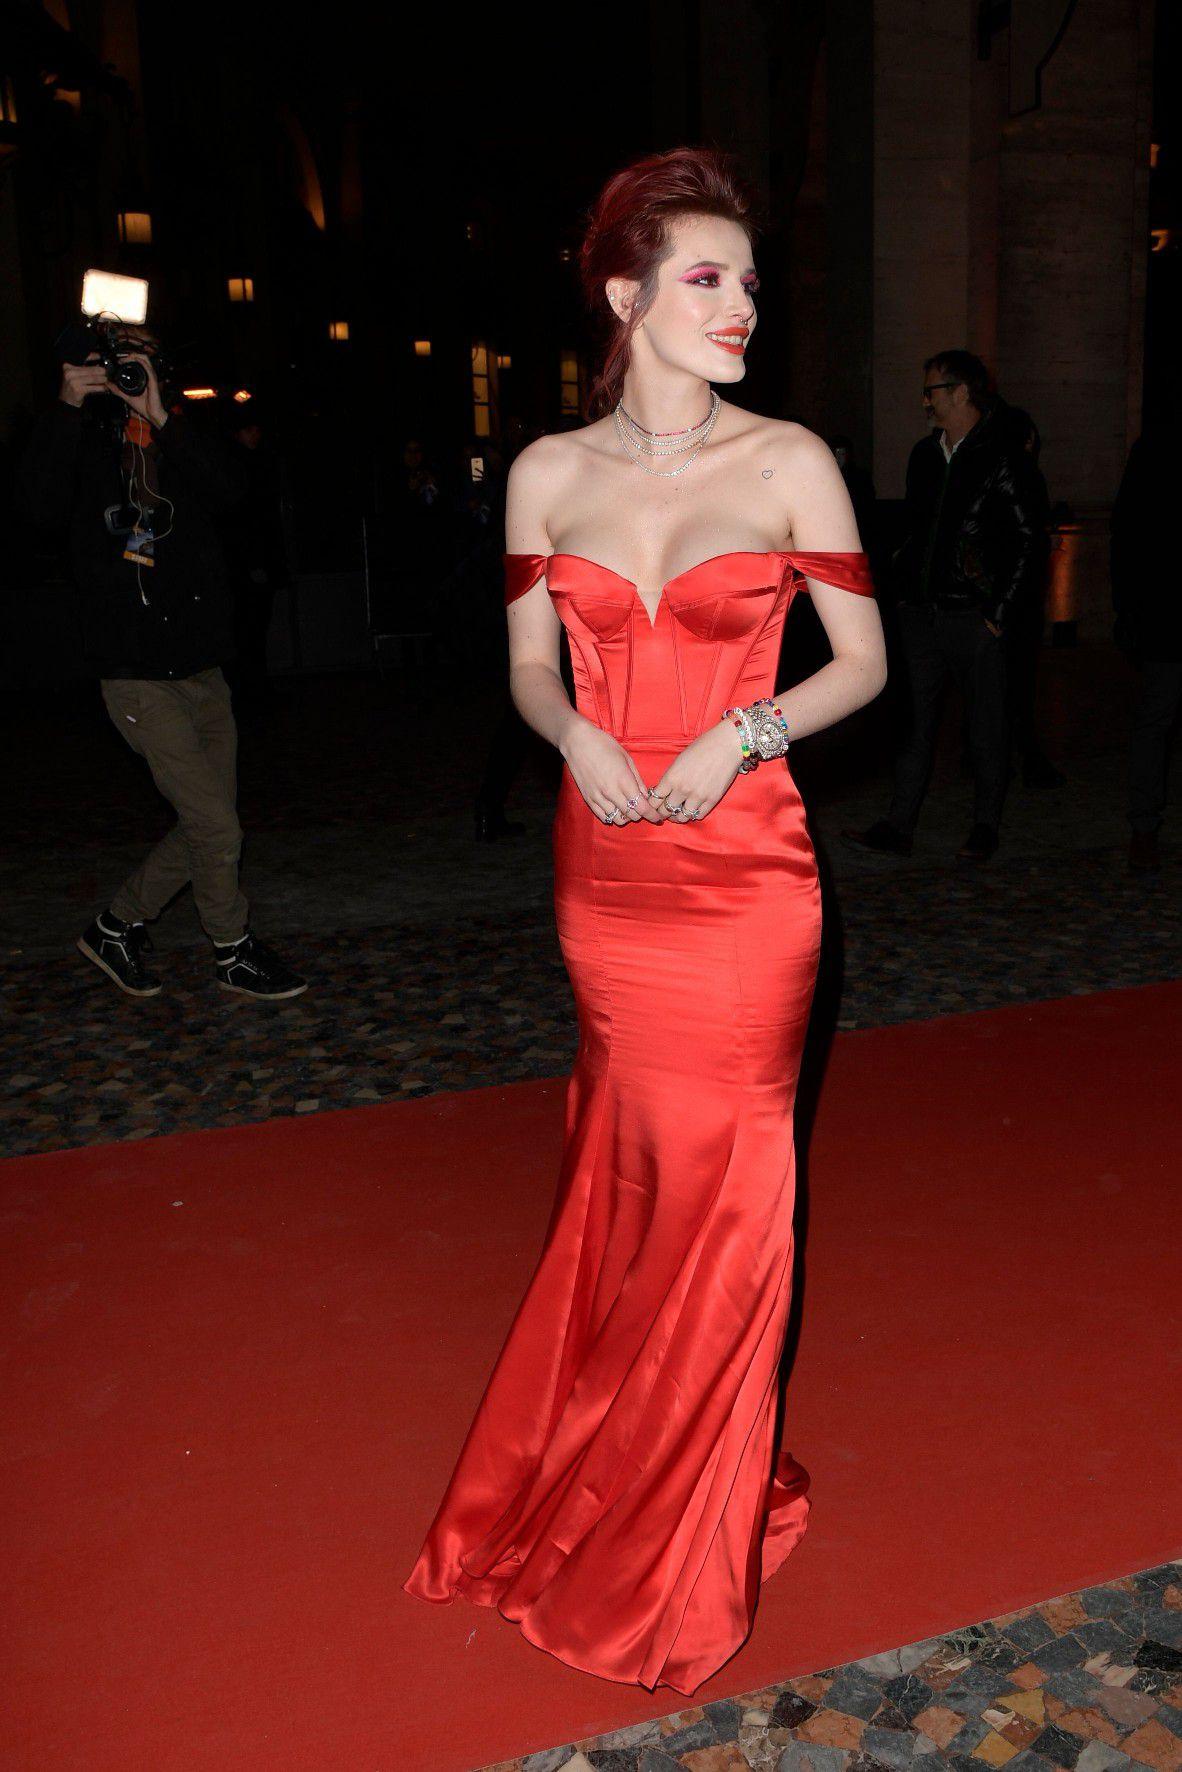 bella-thorne-deep-cleavage-at-midnight-run-premiere-in-rome-1022